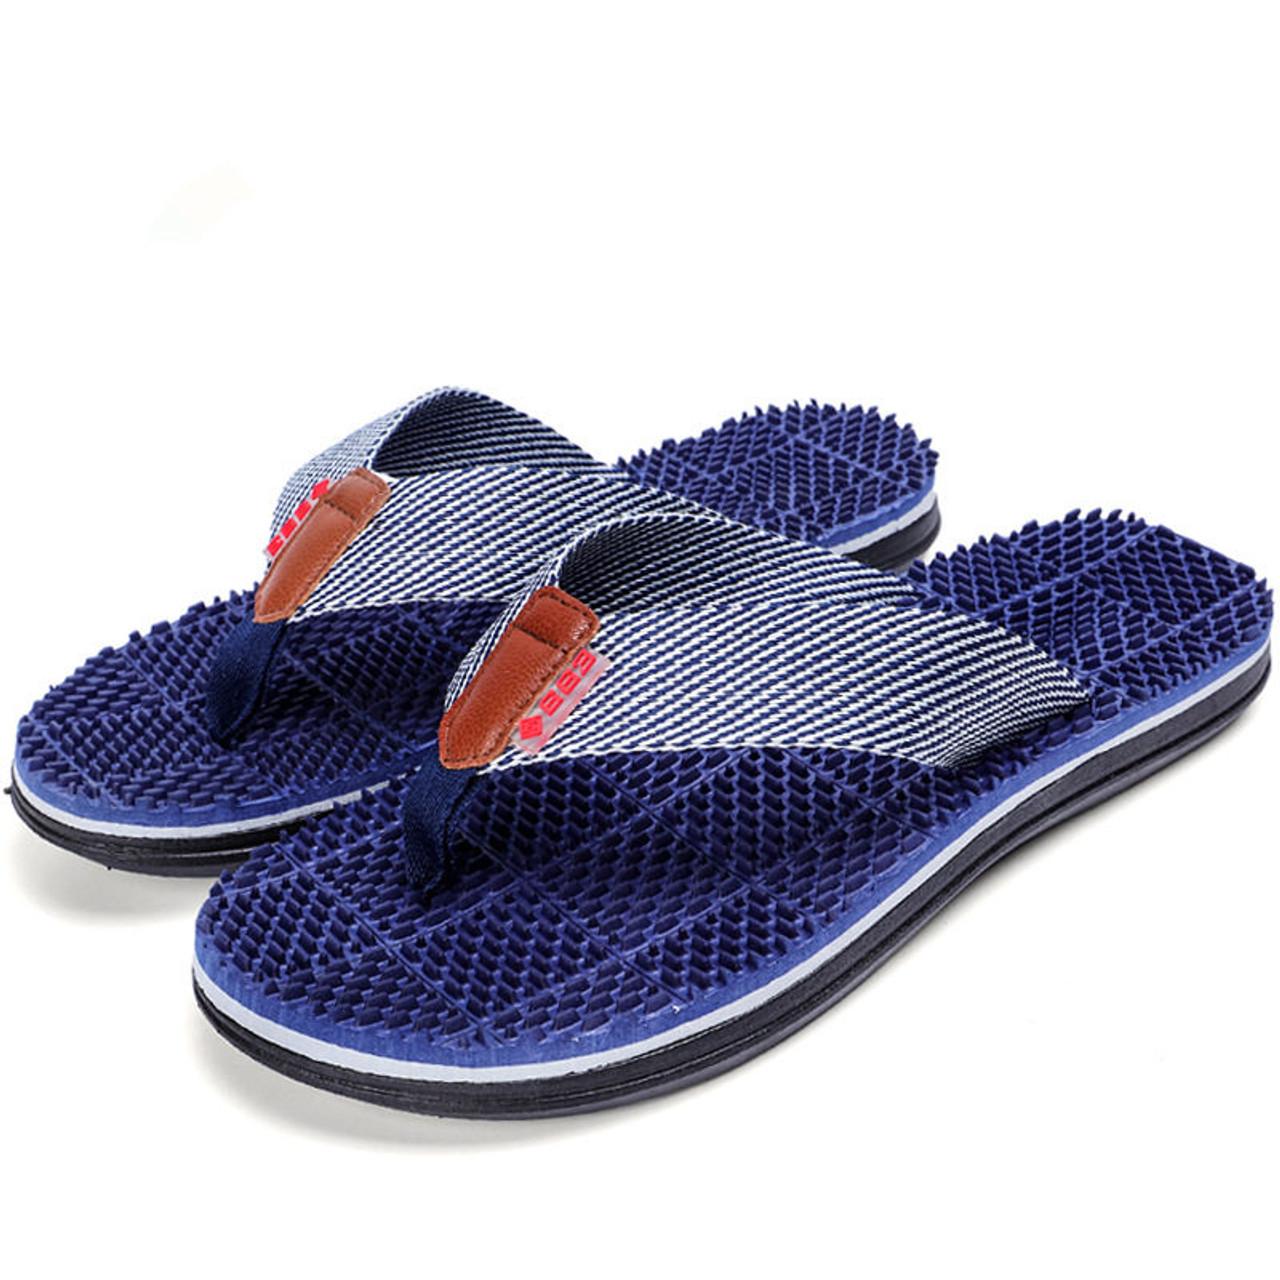 2a98ece267c3 Men Slippers Summer Flat 2018 Summer Men Shoes Breathable Beach Slippers  Wedge Black White Flip Flops ...